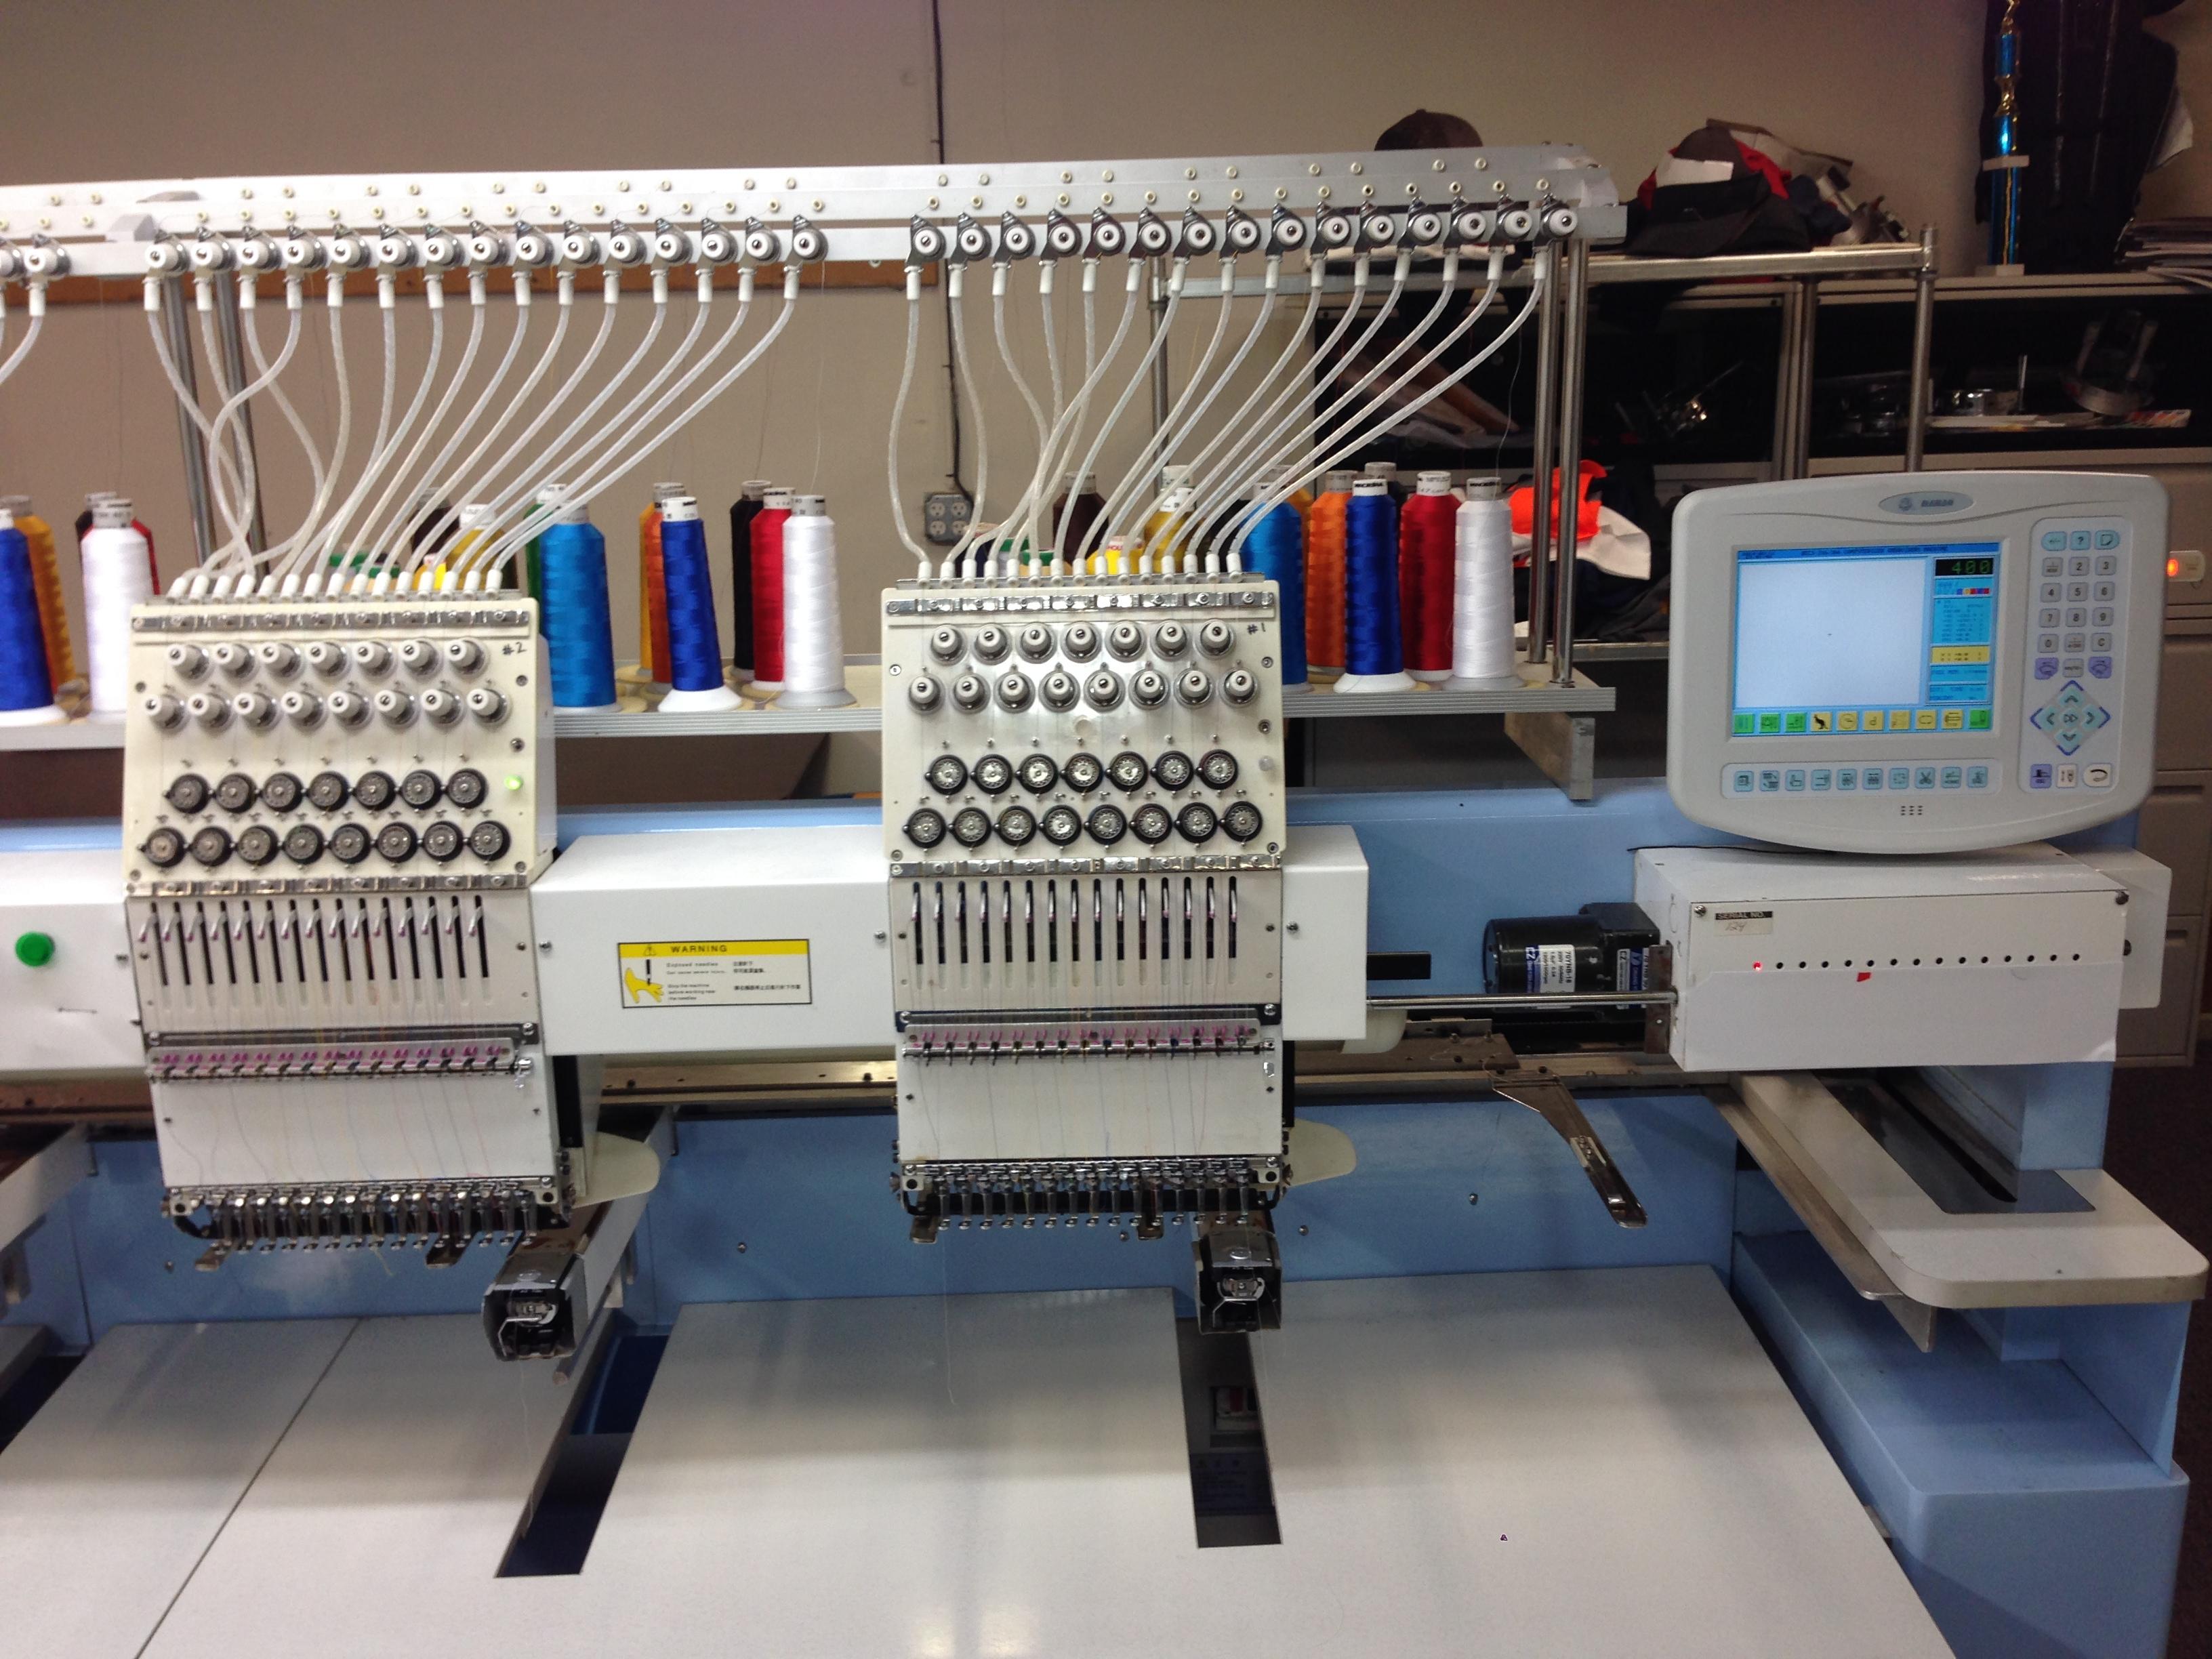 highland embroidery machine